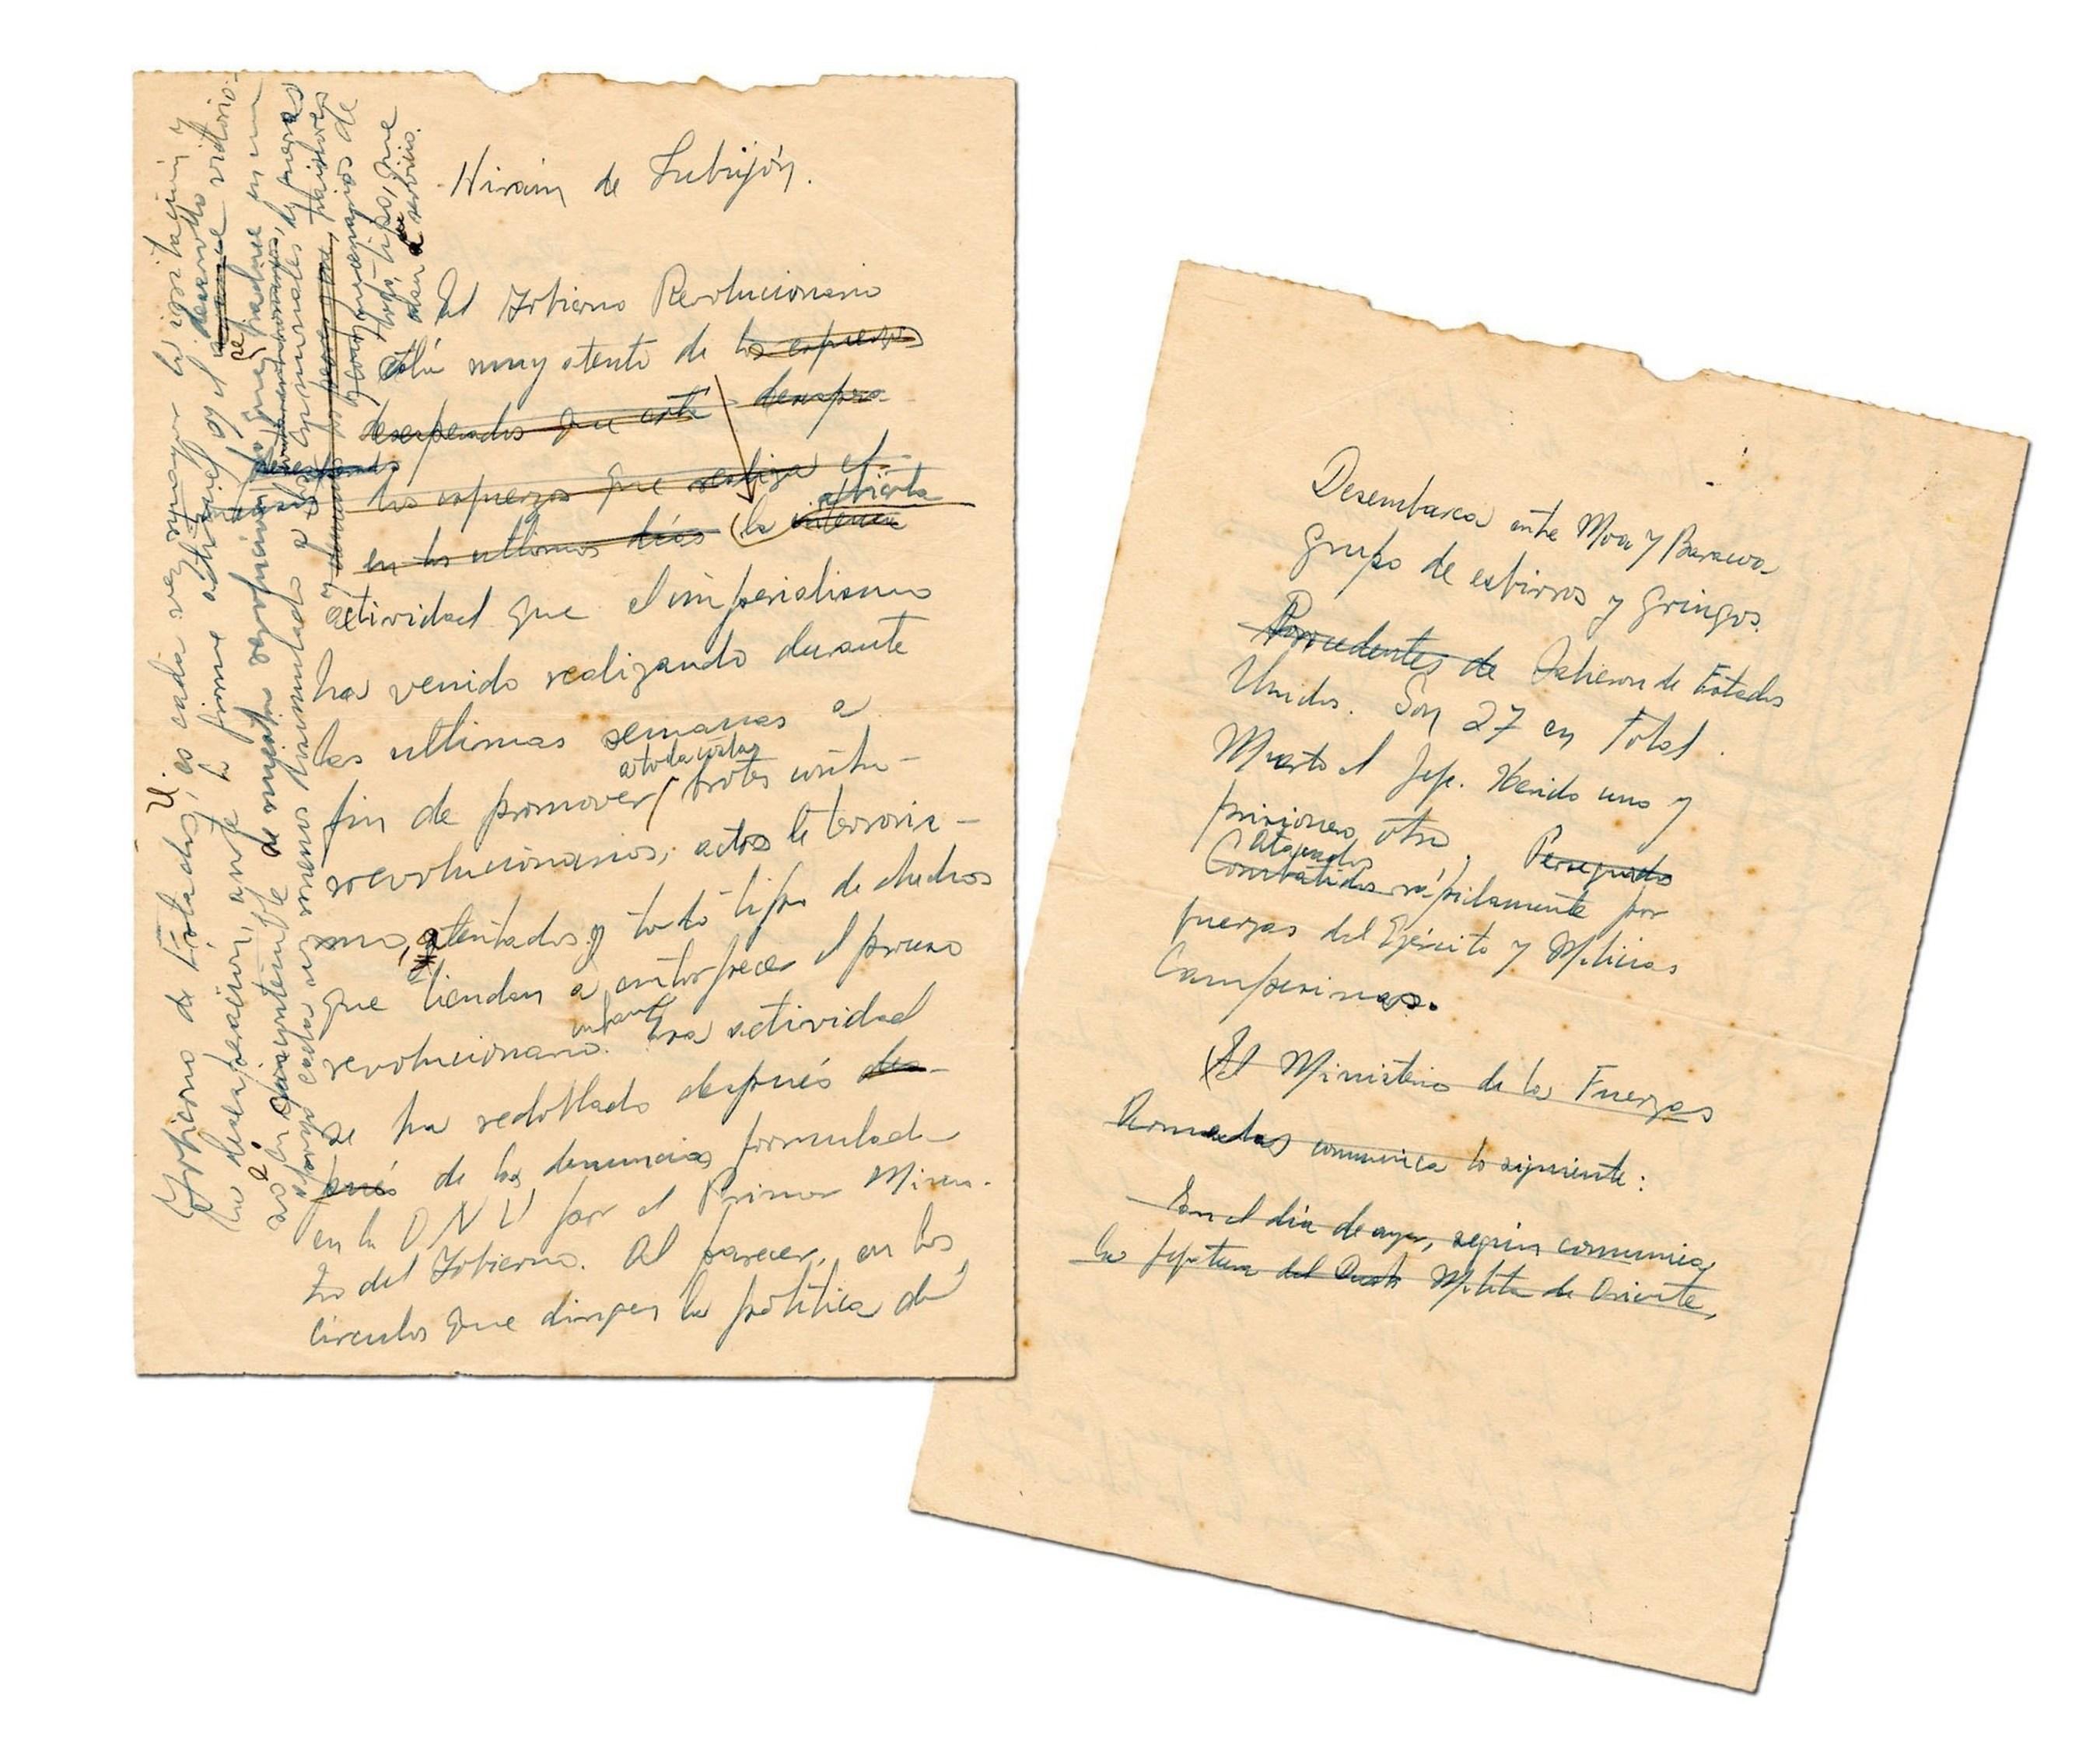 Fidel Castro Handwritten Bay of Pigs Manuscript Hits the Auction Block